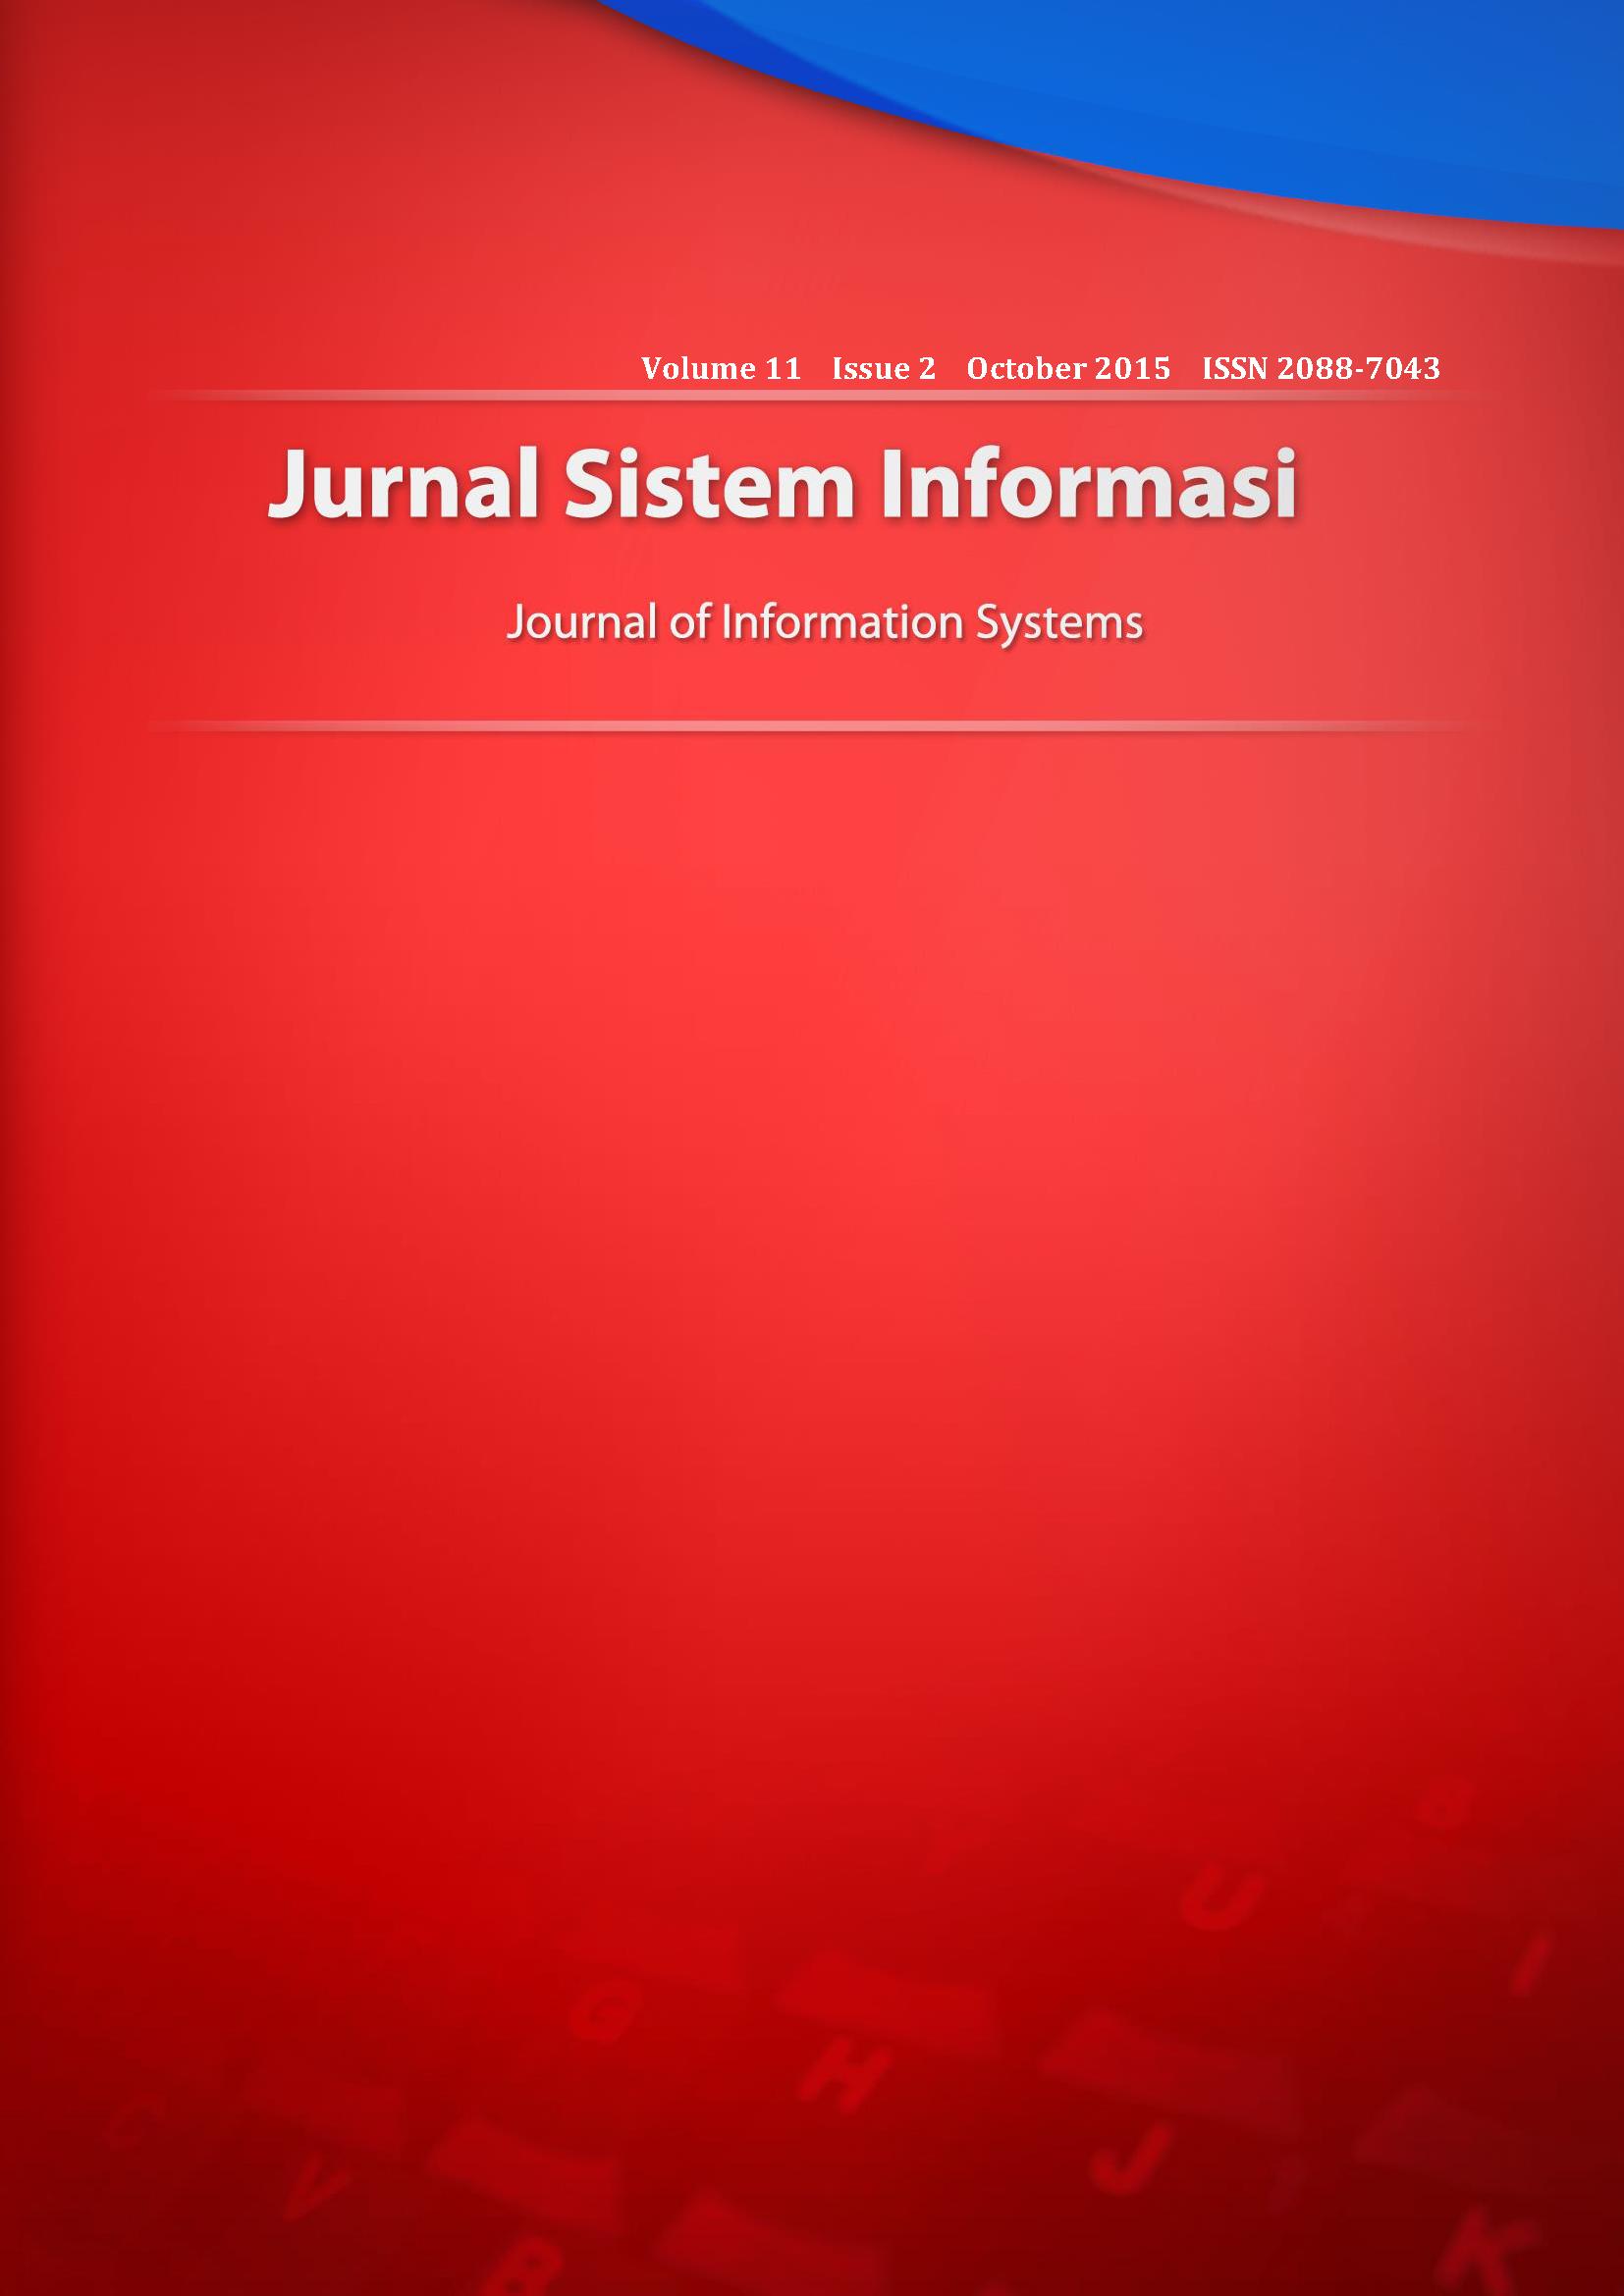 Jurnal Sistem Informasi